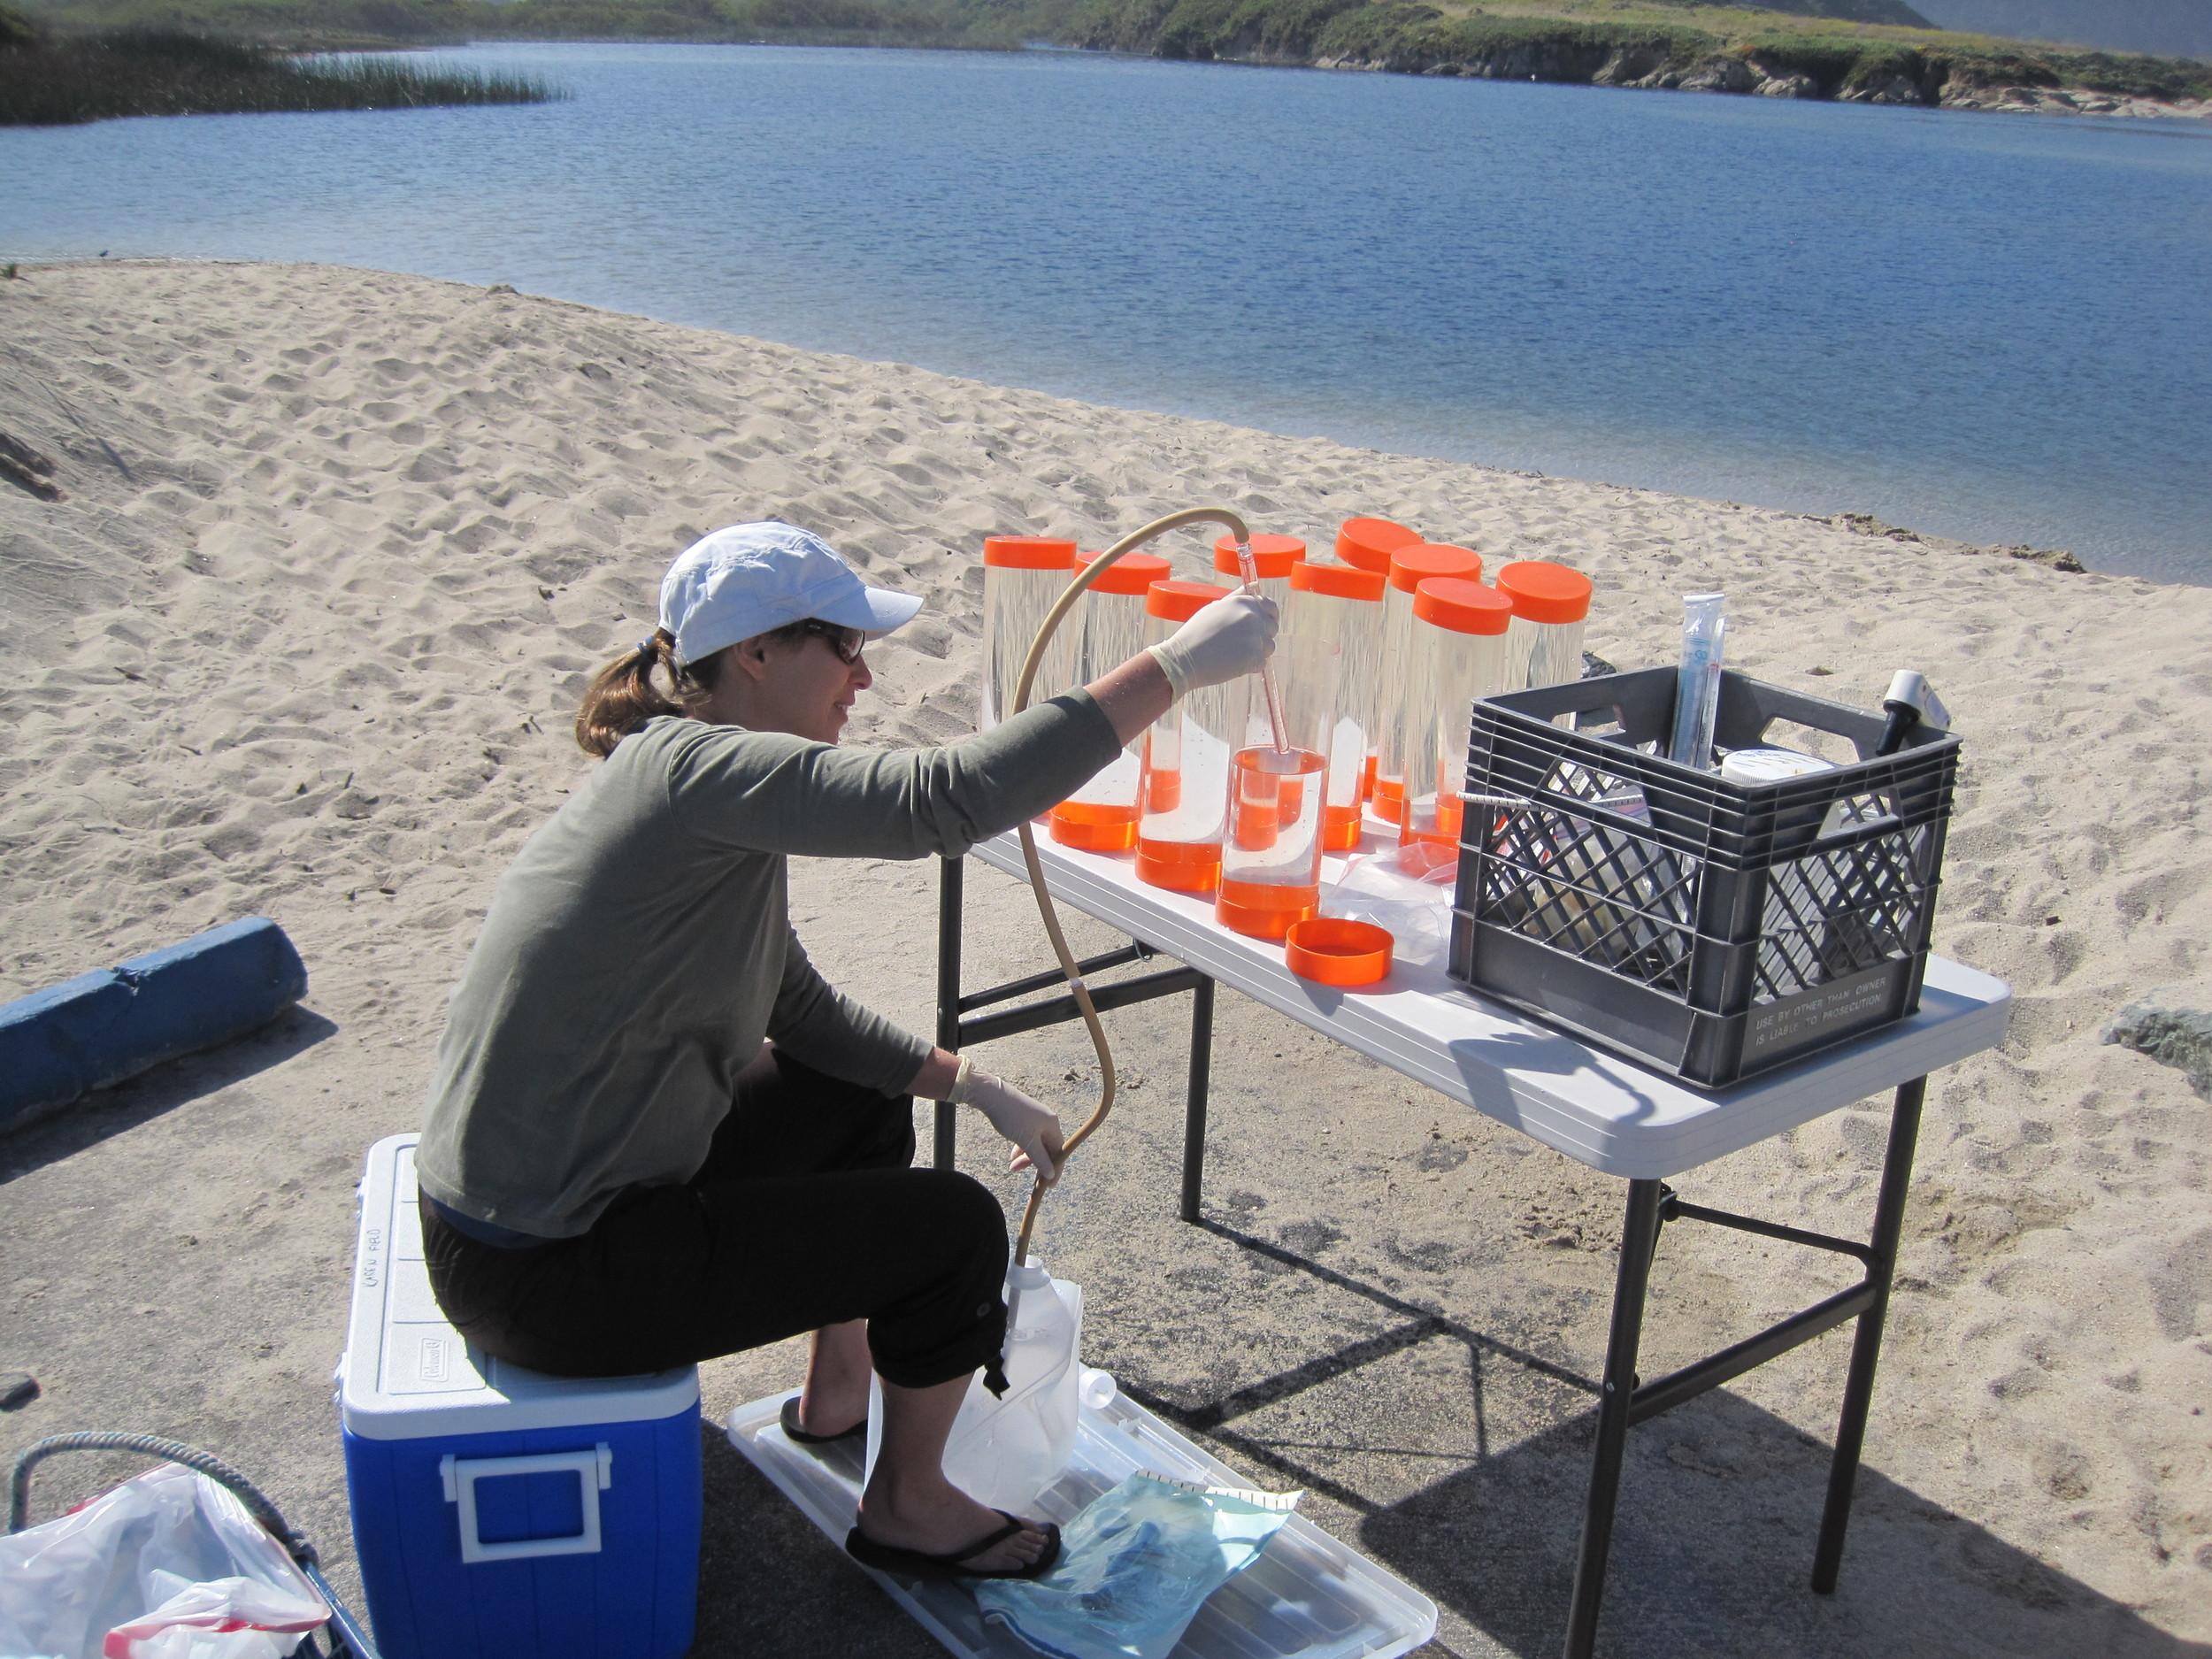 Dr. Karen Shapiro working in the Monterey Bay.